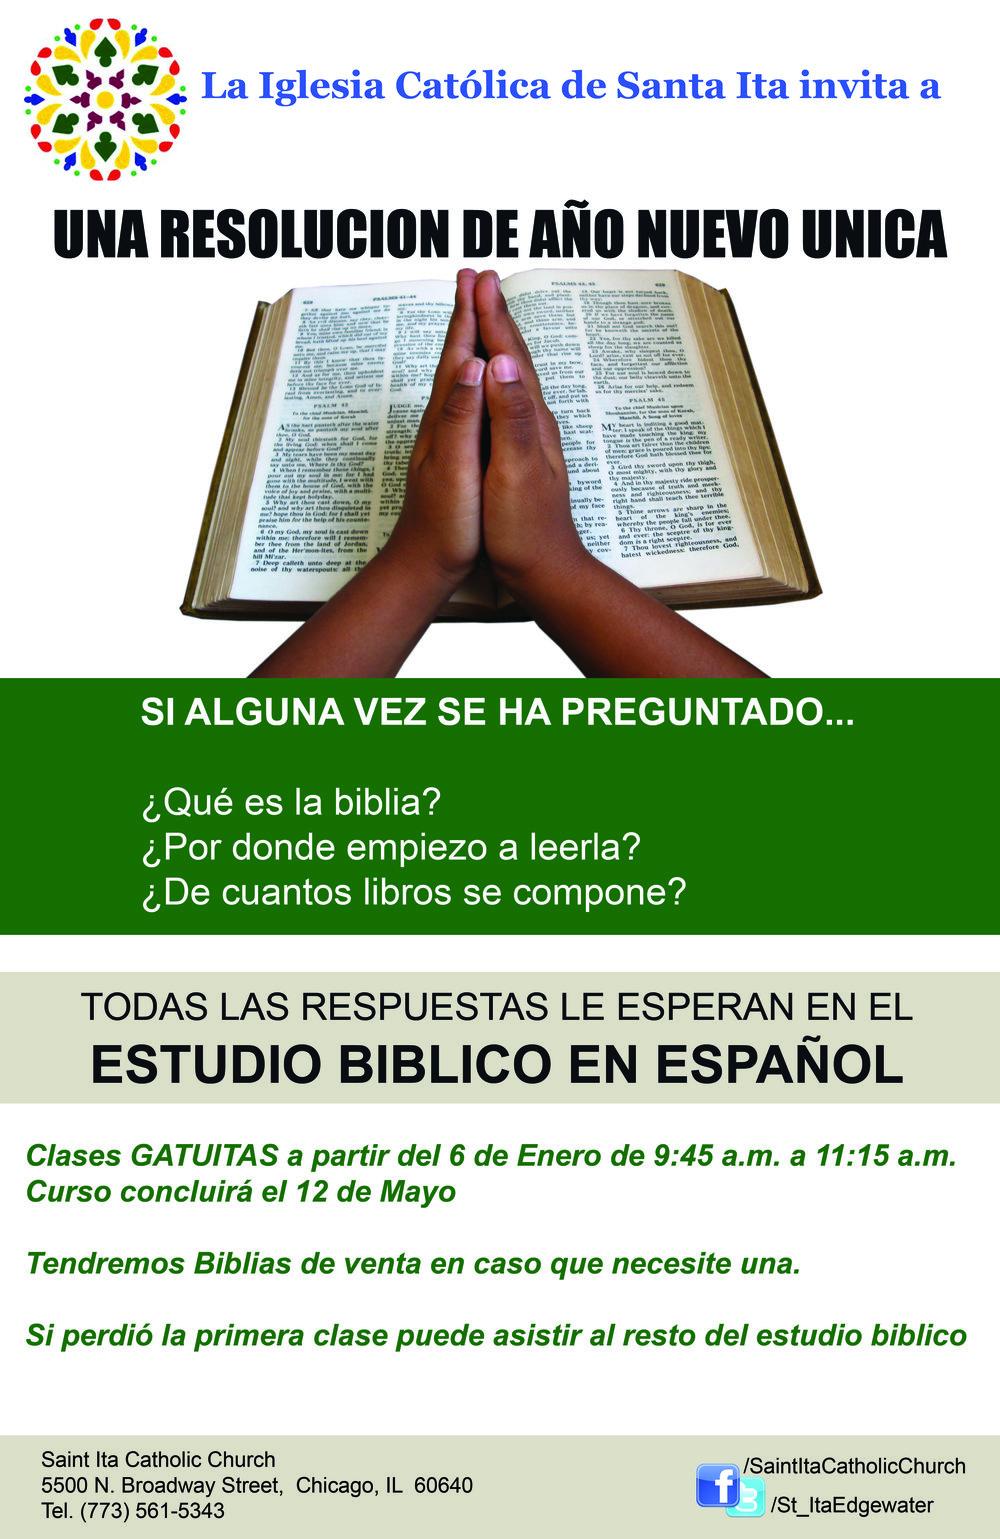 estudio biblico poster 010618.jpg